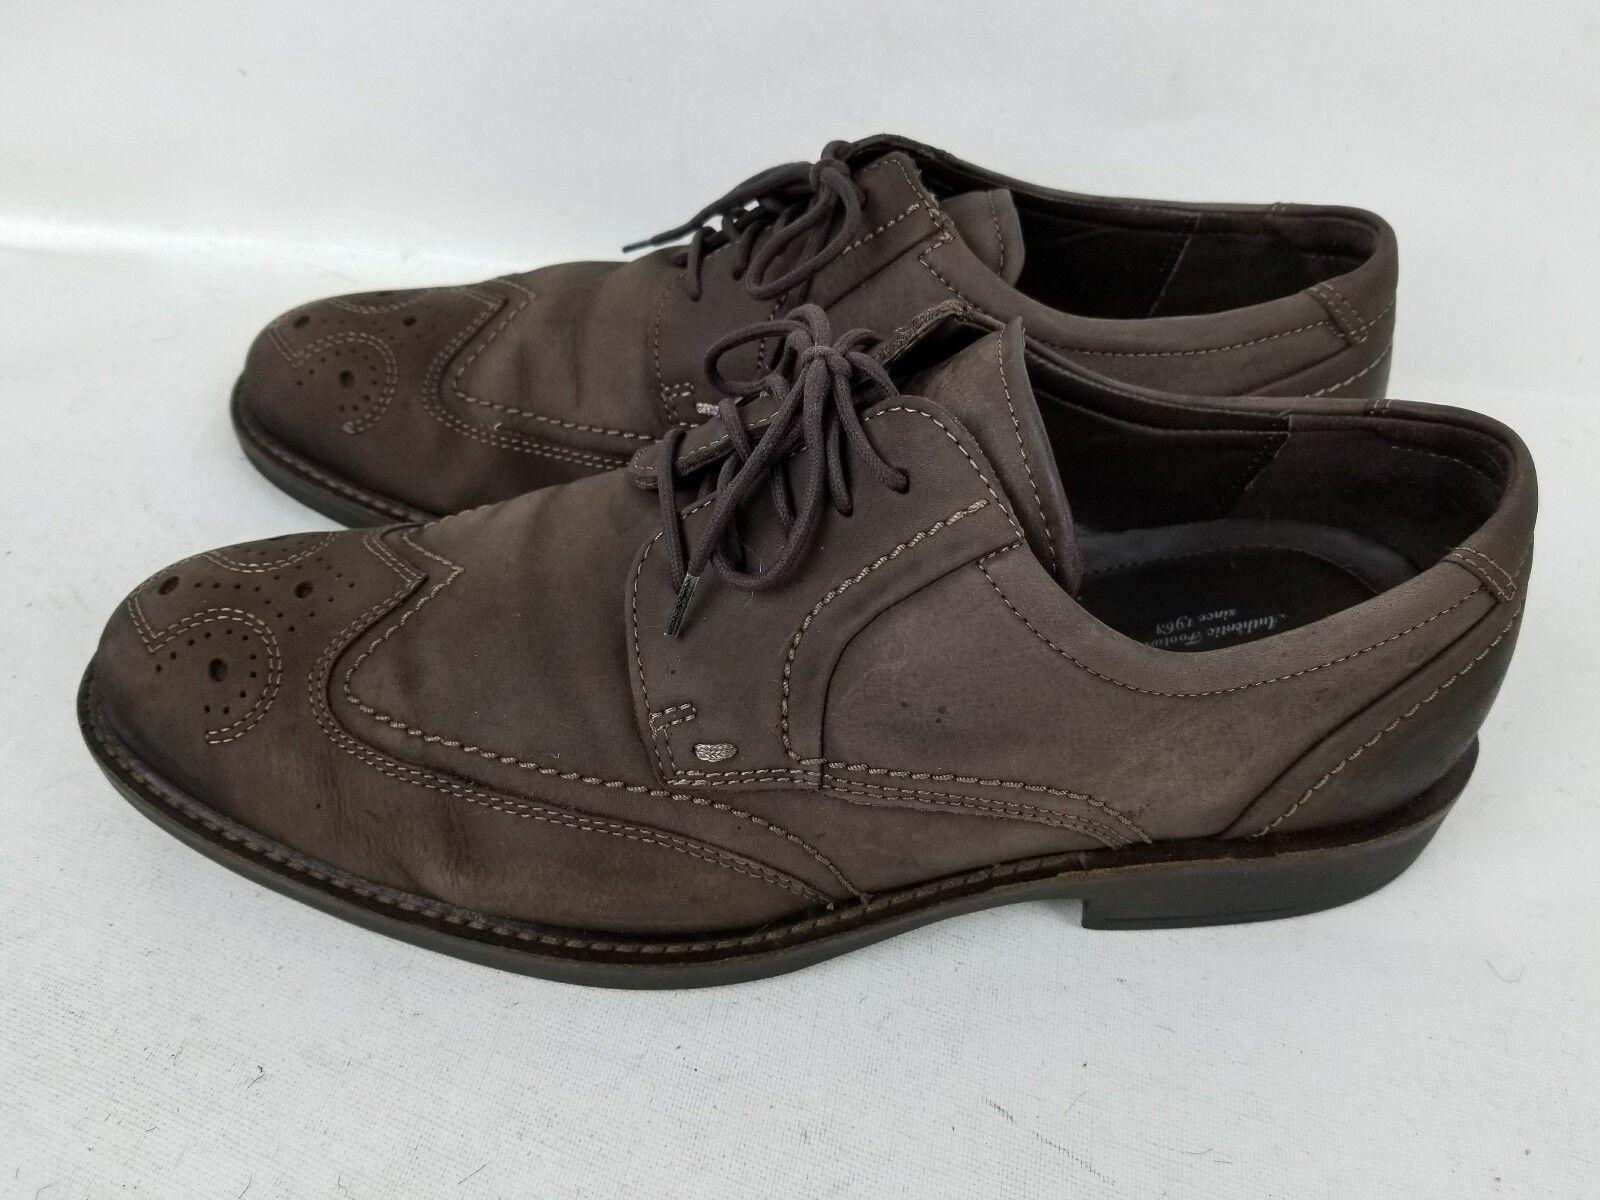 ECCO Authentic Uomo City Walker Wingtip Brown Pelle oxford Shoes EU 43 US 9-9.5